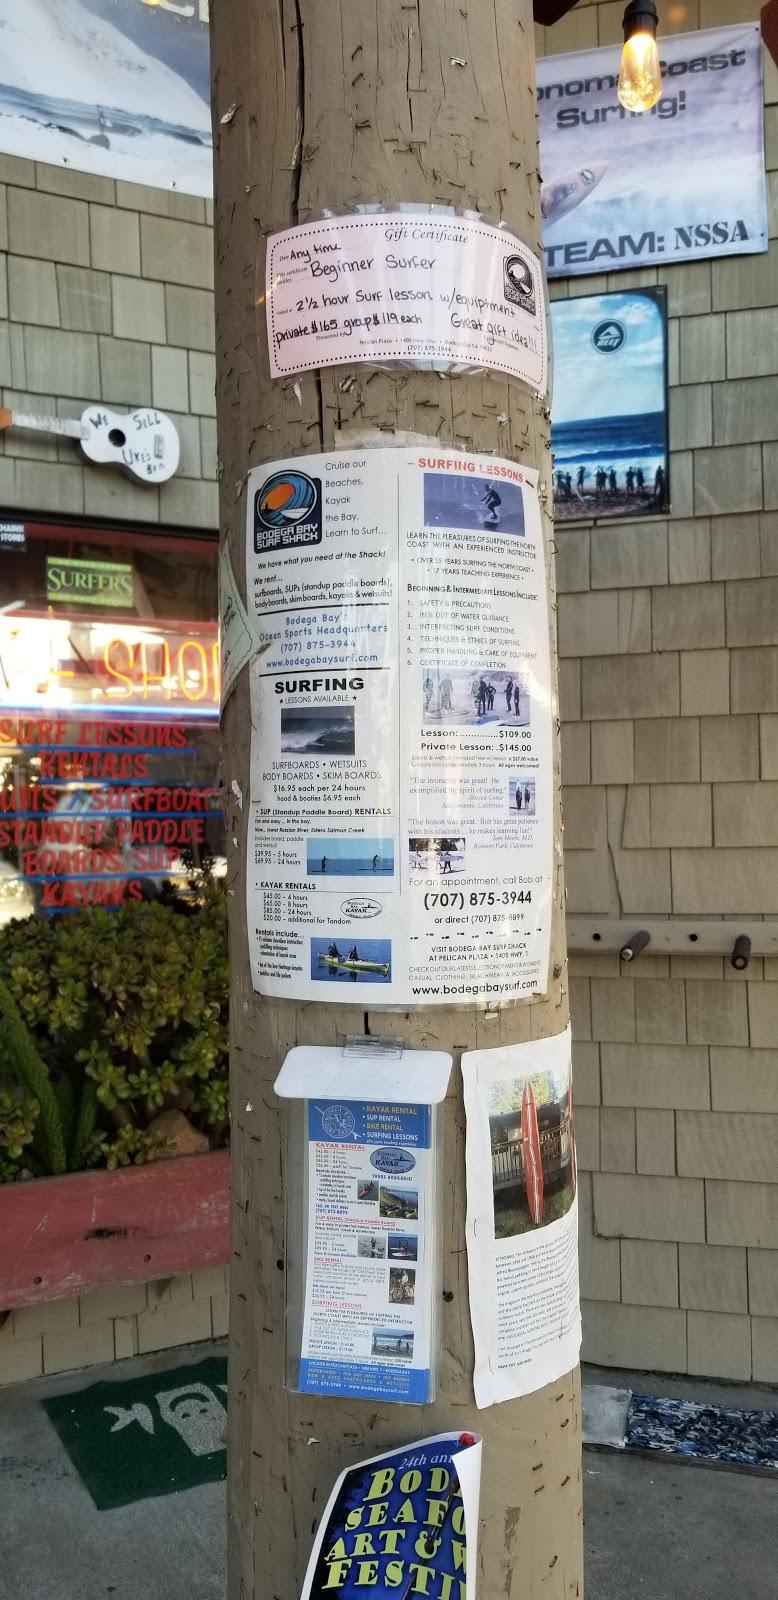 Bodega Bay Surf Shack - store  | Photo 6 of 8 | Address: 1400 CA-1 e, Bodega Bay, CA 94923, USA | Phone: (707) 875-3944